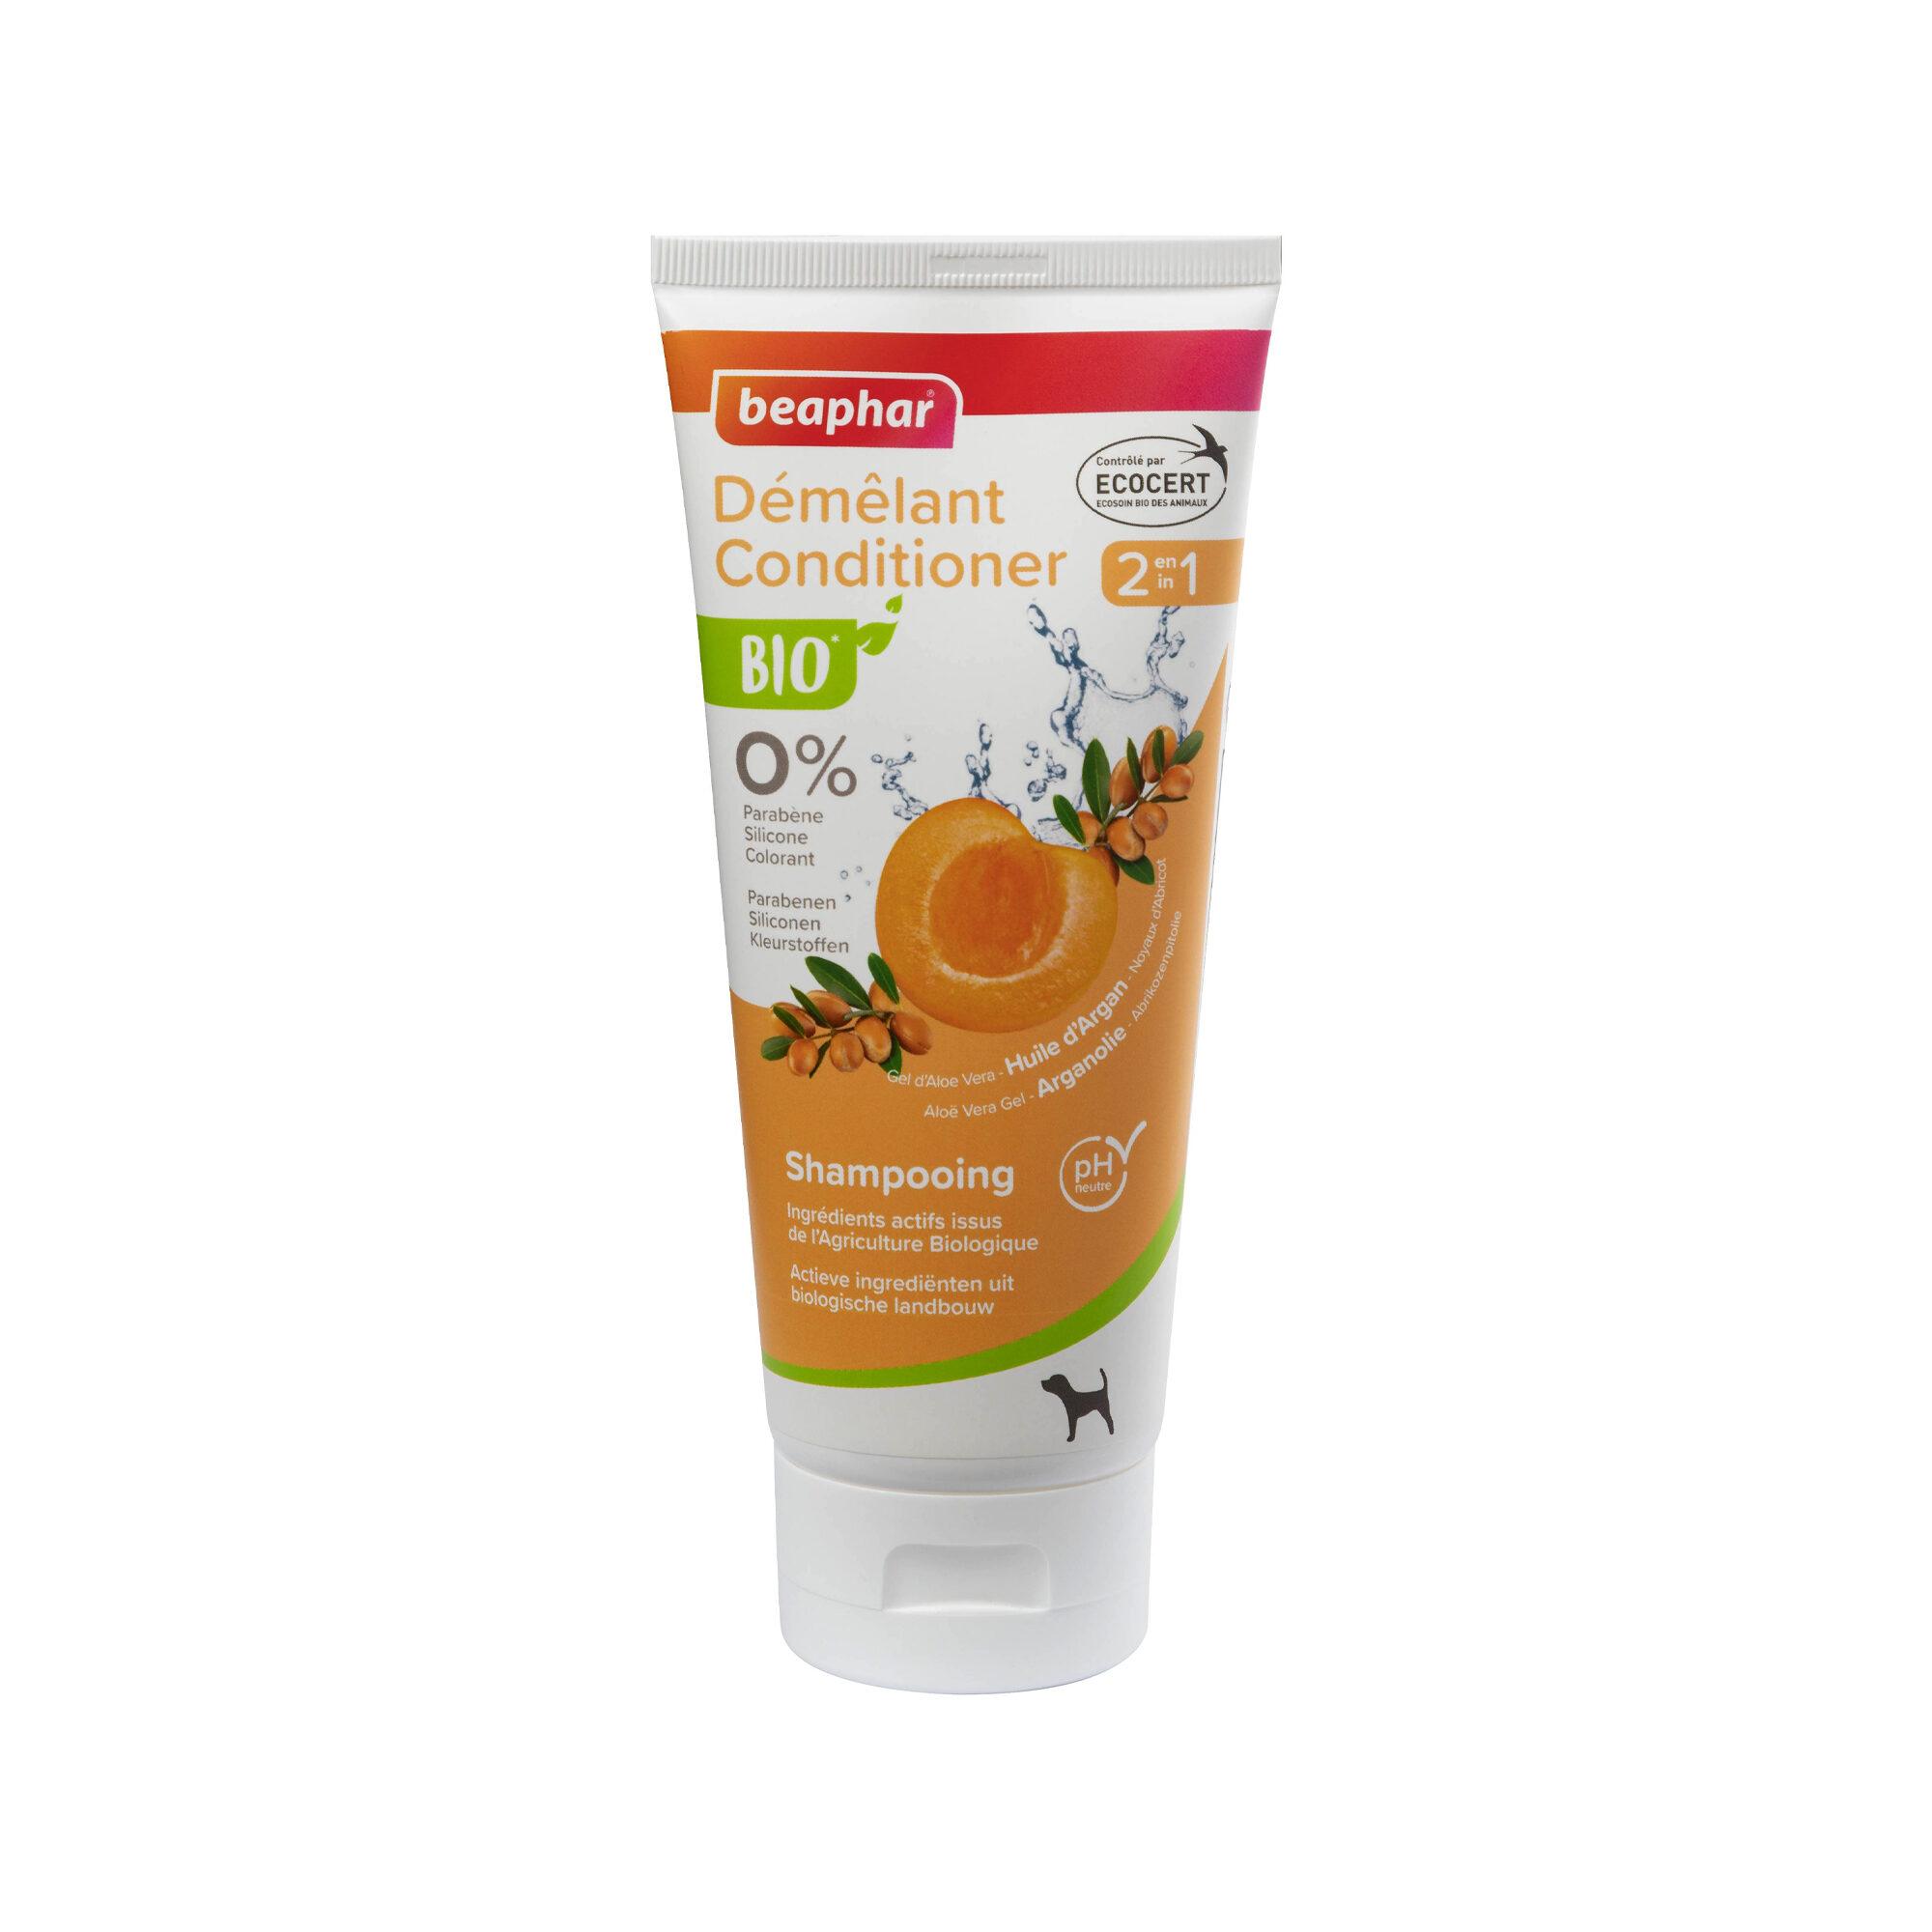 Beaphar Bio Shampoo & Conditioner 2 en 1 pour chien - 200 ml